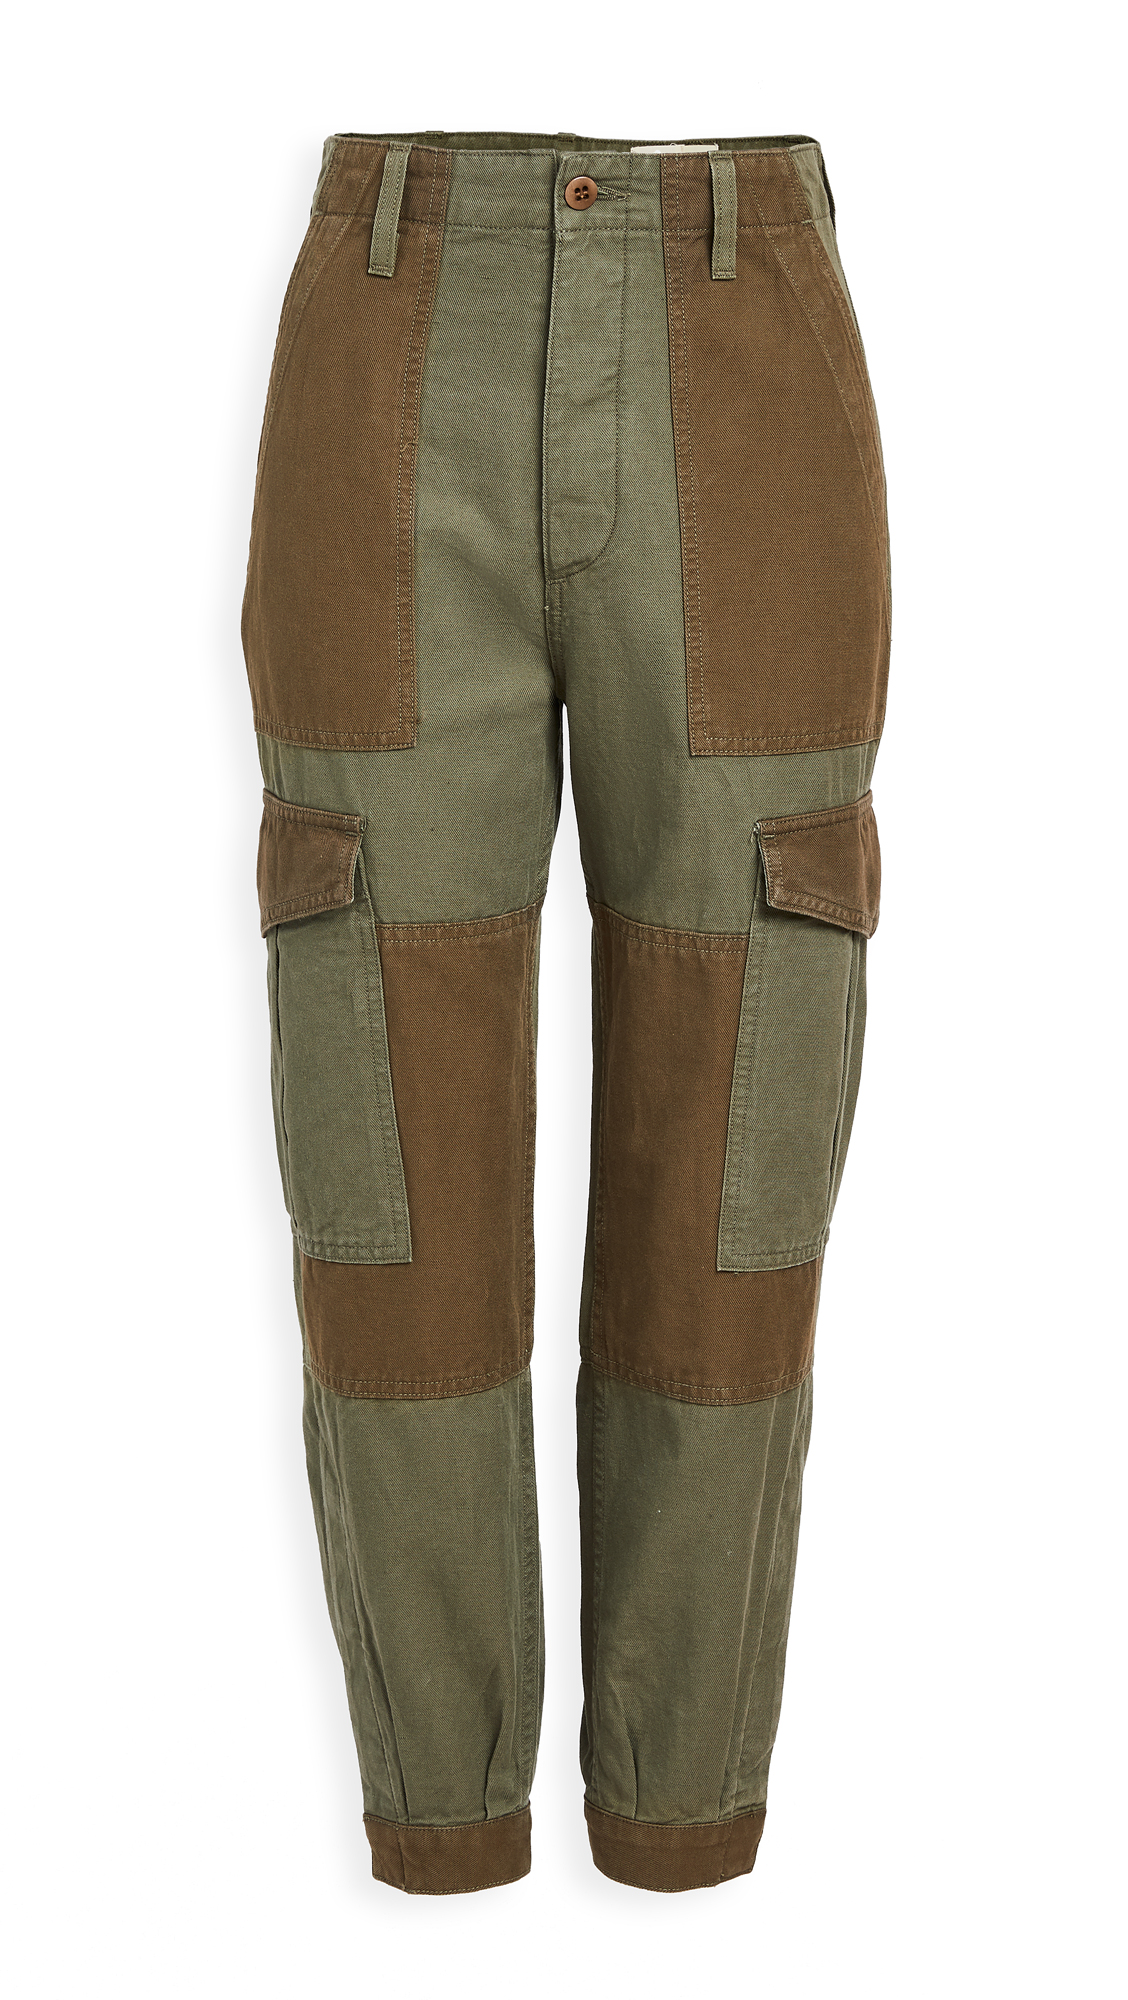 Citizens of Humanity Greta Cuffed Leg Surplus Pants